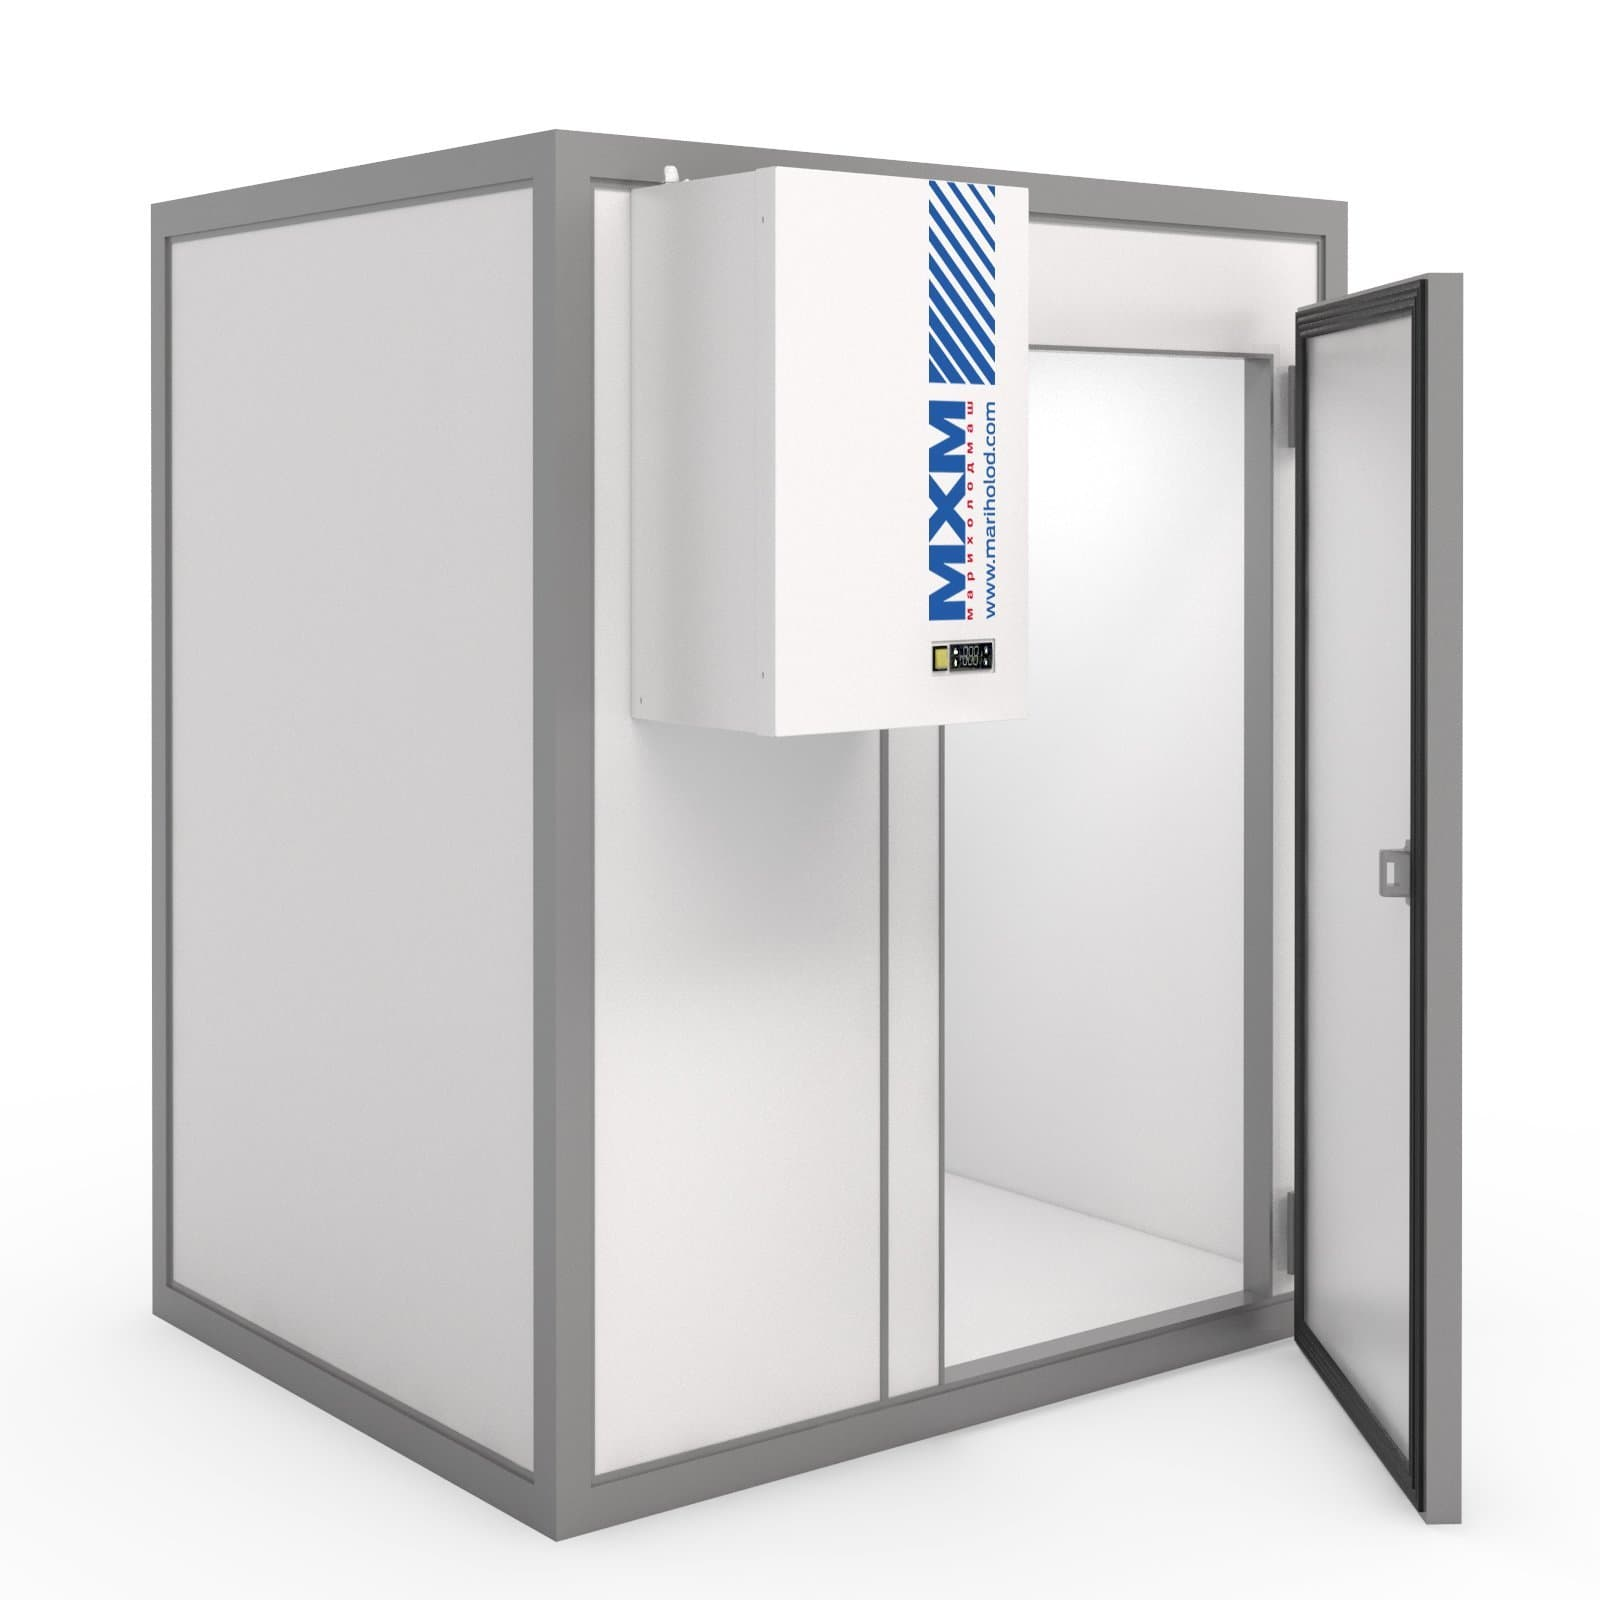 Камера холодильная МХМ КХН-55,30 2560×9160×2720